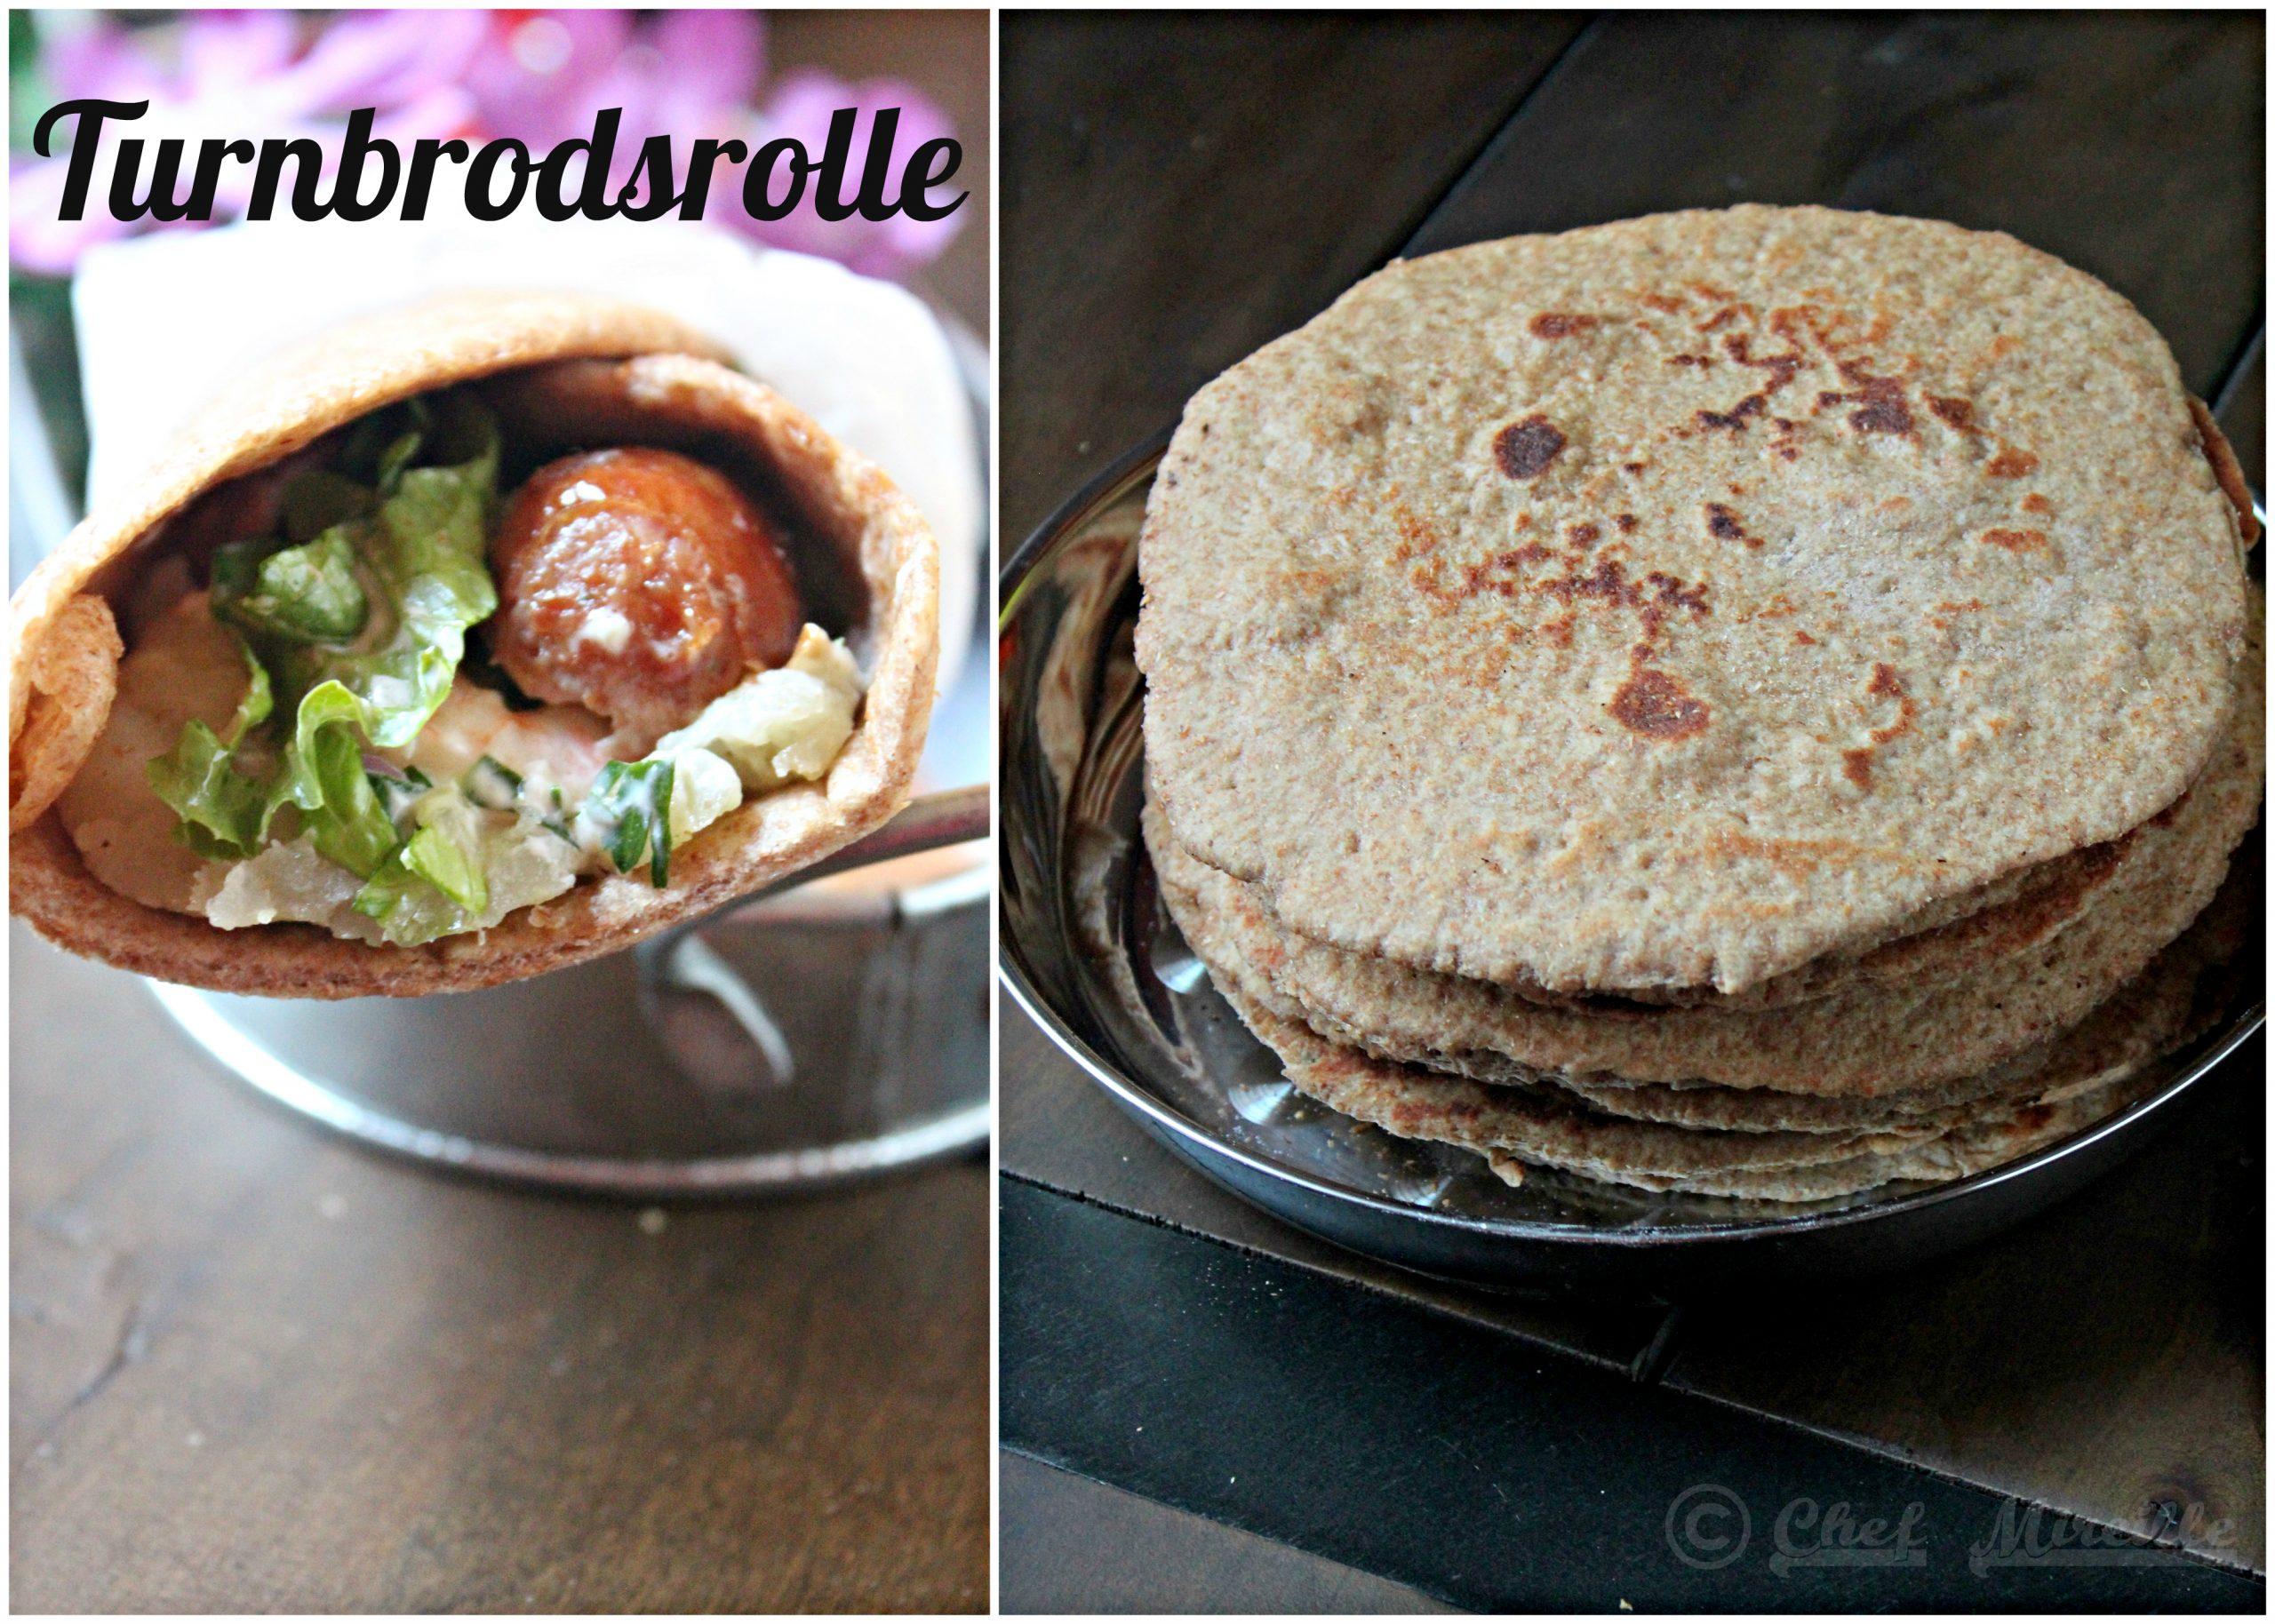 Turnbrod - Turnbrodsrolle - Swedish Street Food Rye Wraps